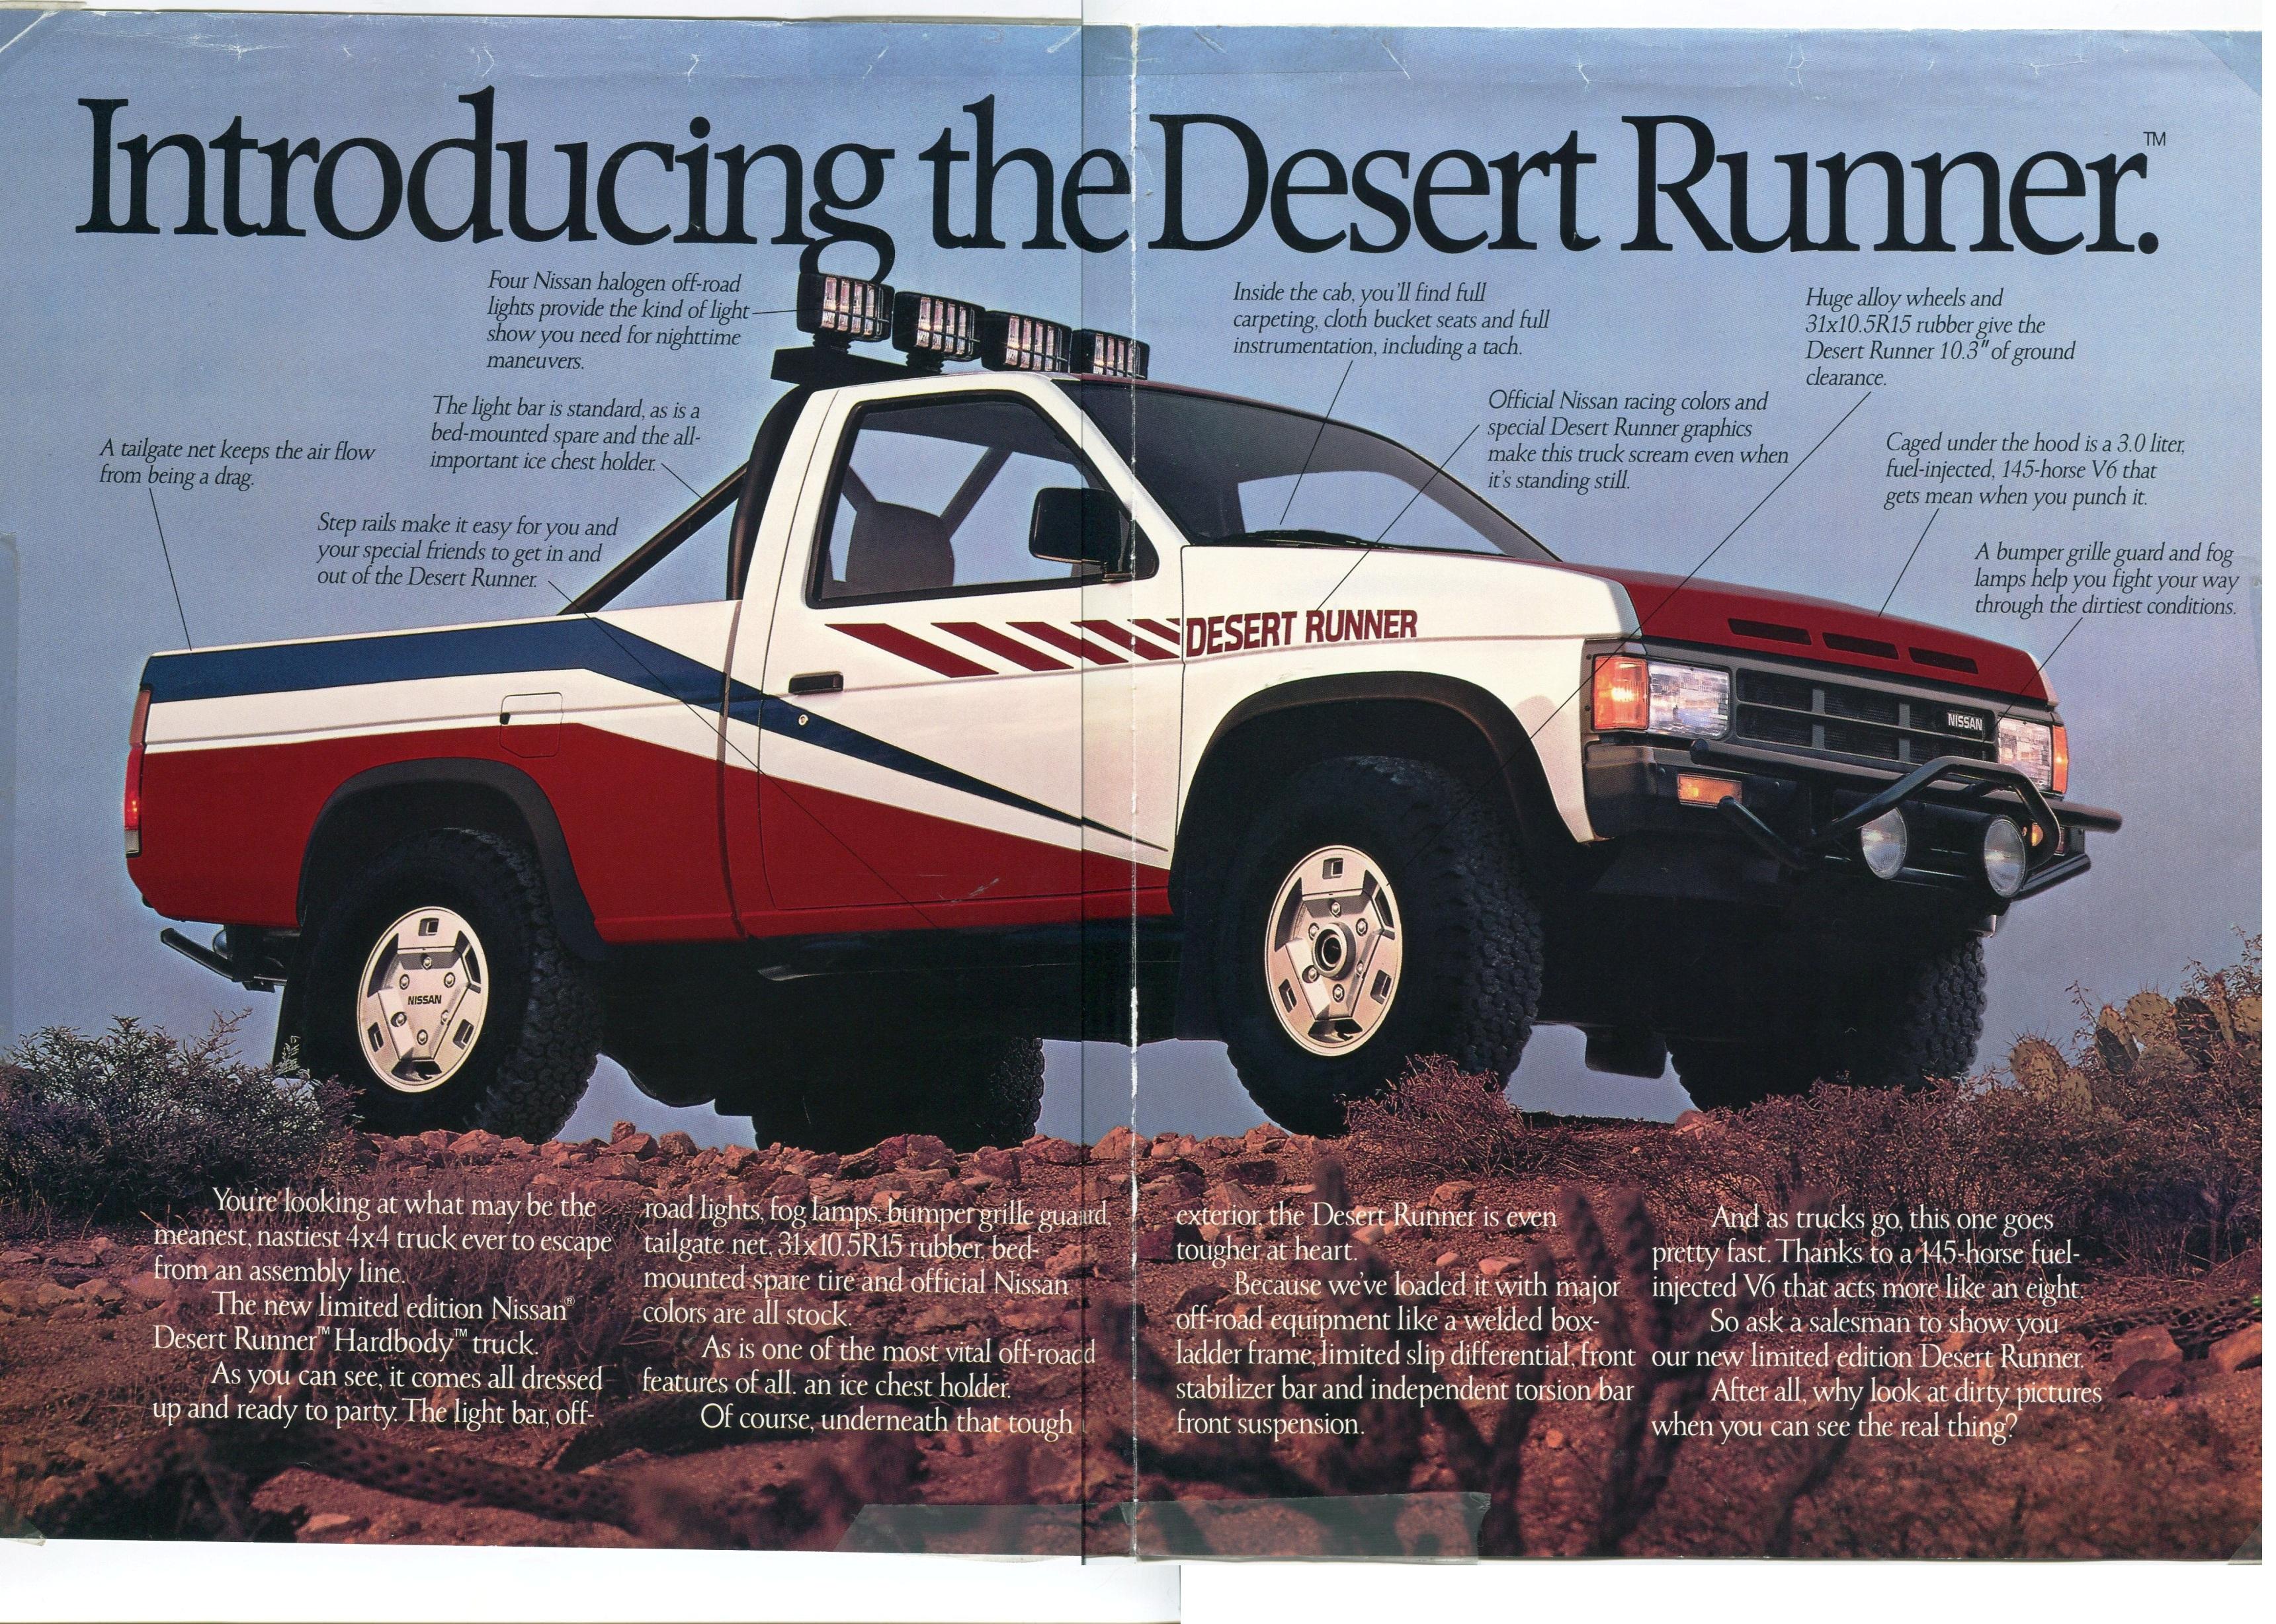 runner desert nissan 1988 hardbody brochure light dealer ad rides debadged nicoclub late rare craigslist versions sized thumbnails each please